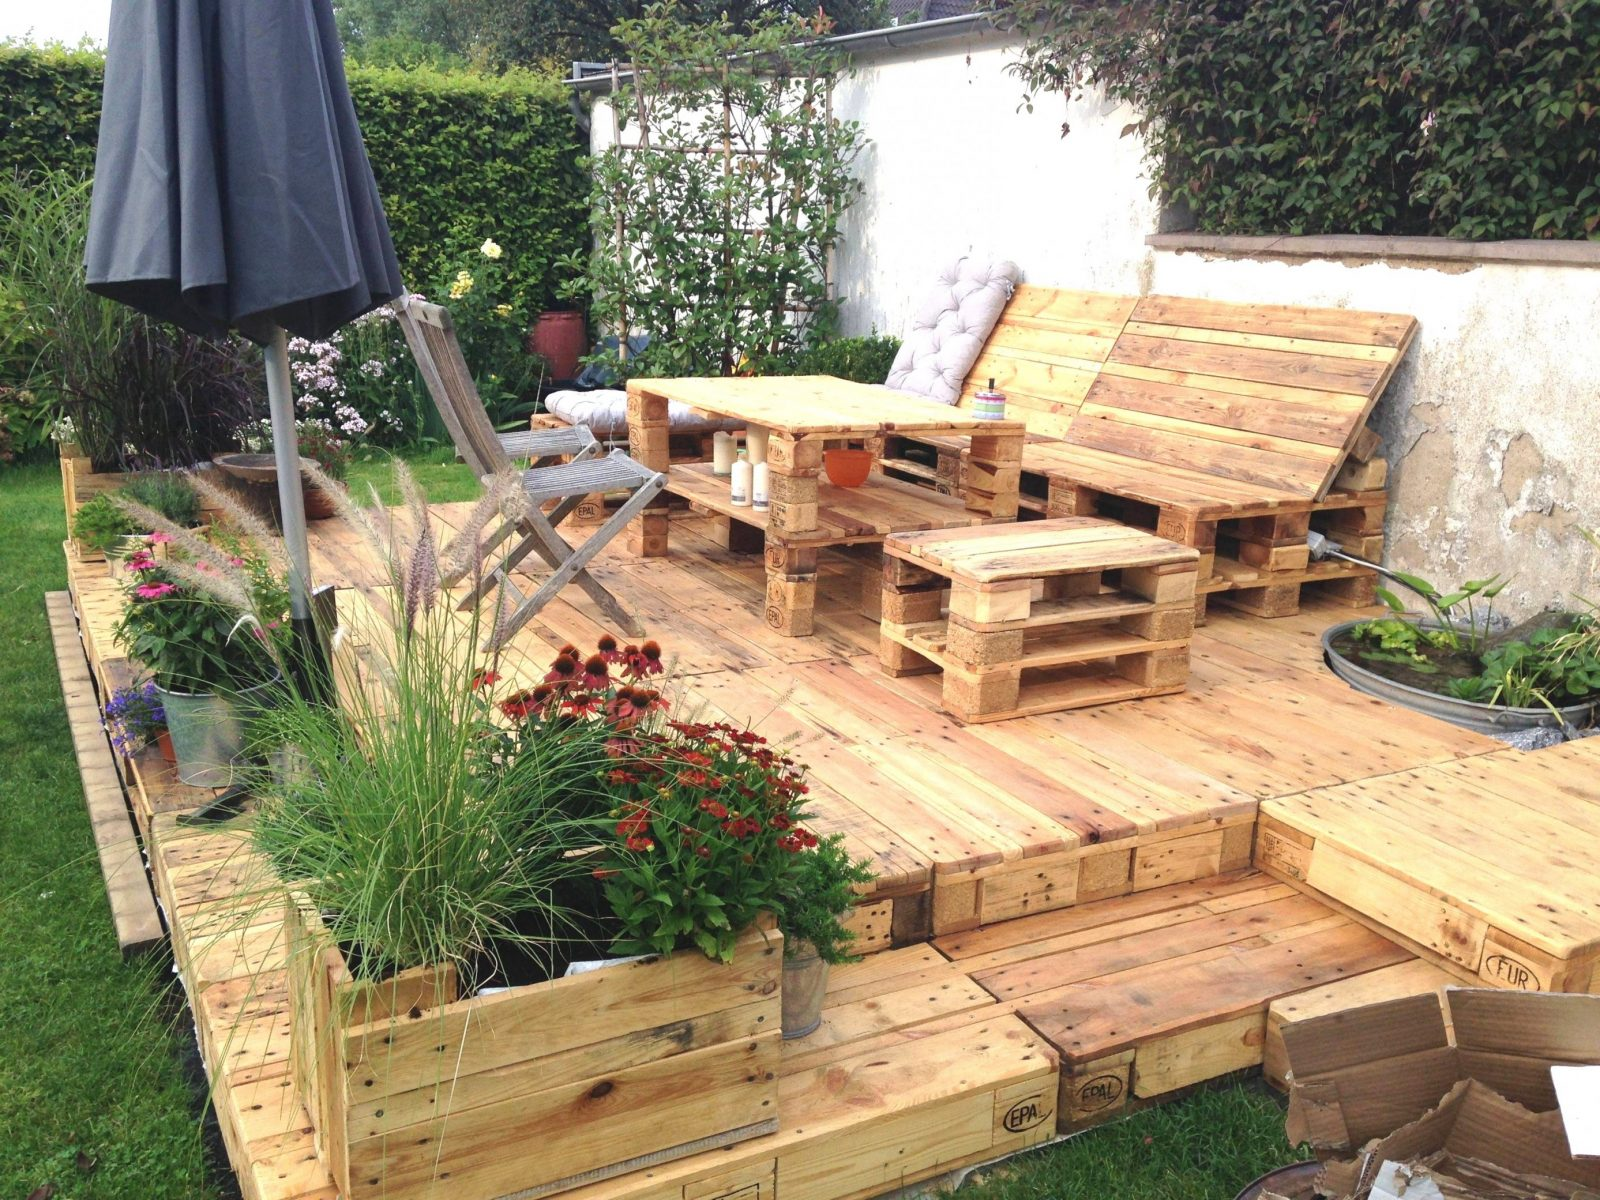 Deko Idee Garten Genial Fantastisch 40 Deko Ideen Mit Steinen Im von Deko Ideen Mit Steinen Im Garten Photo